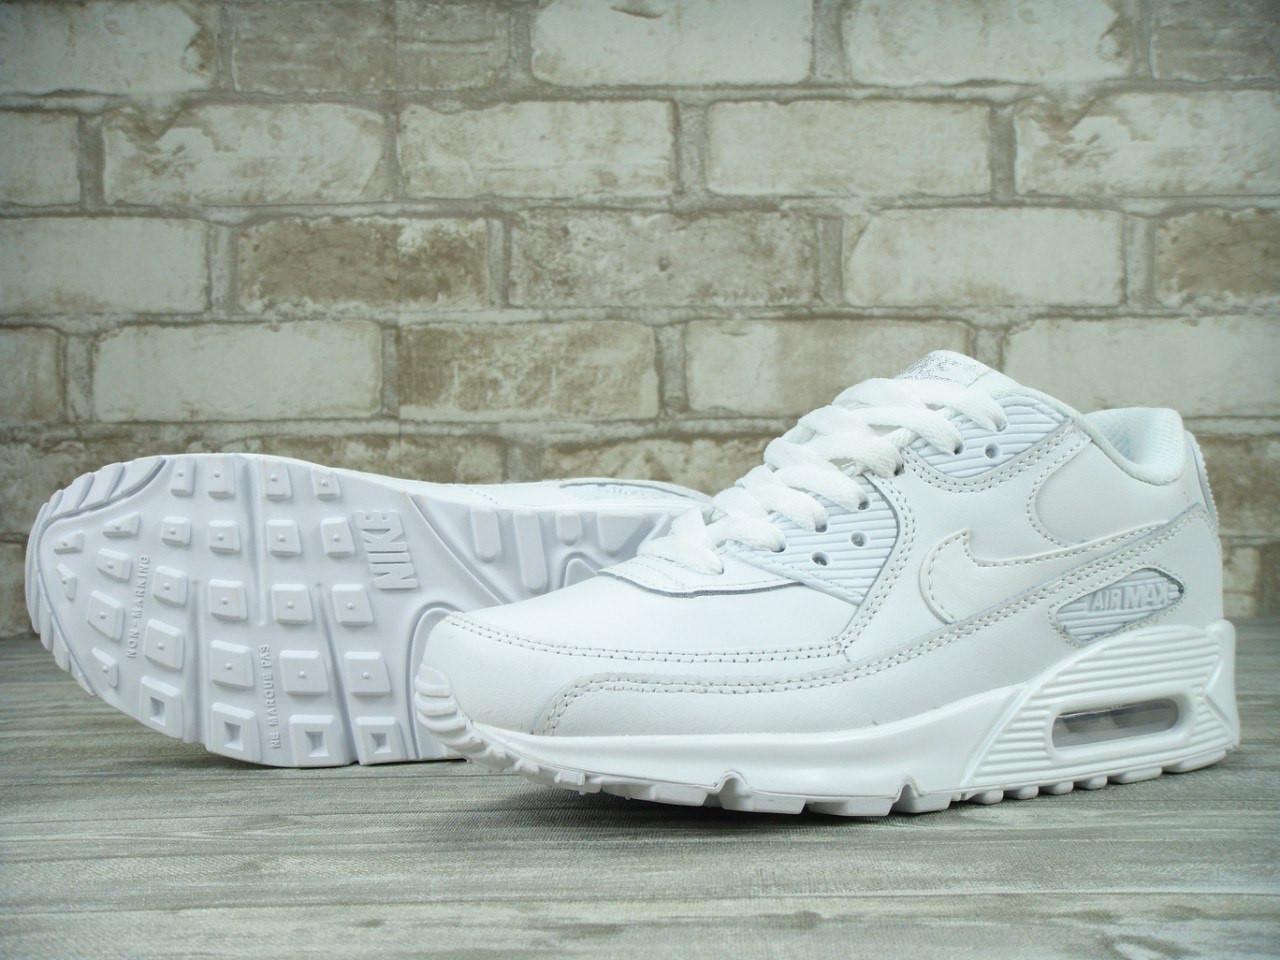 96c56ce2 Nike Air Max 90 all white кроссовки унисекс (Реплика ААА+) - Monkey Vape